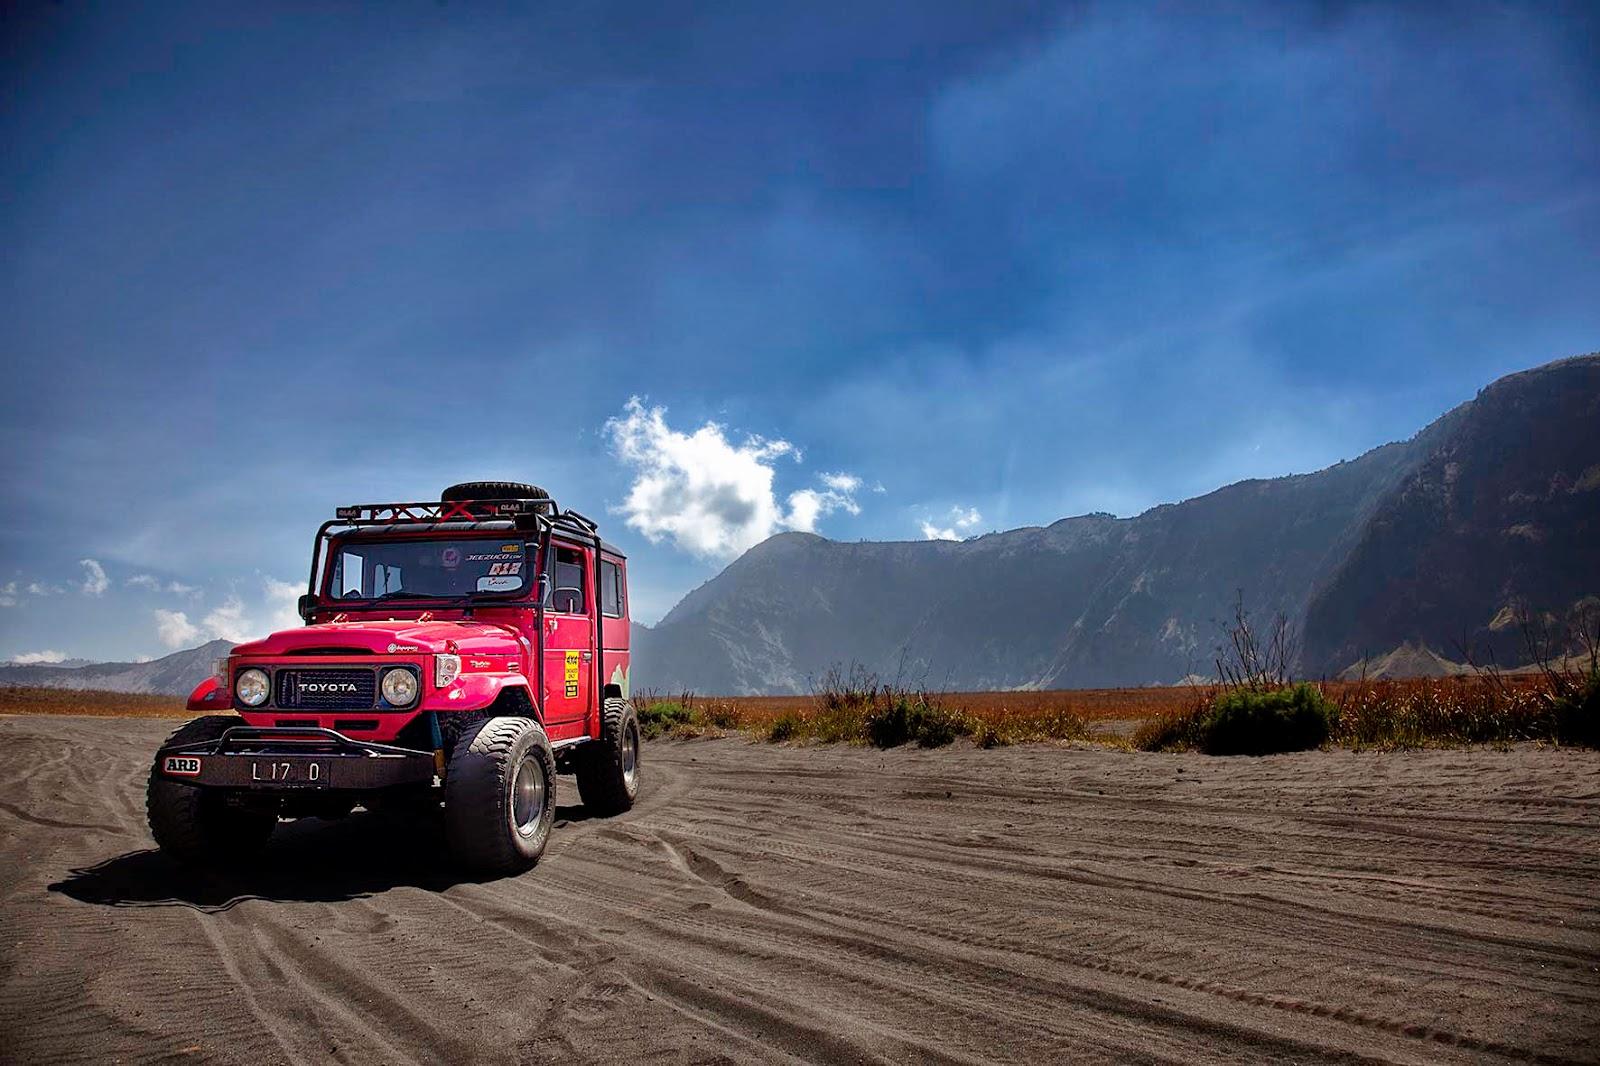 jeep bromo murah, jeep bromo sewa, sewa jeep bromo, http://rentalsewamobilmalangbatu.com/, Telkomsel 0821 41555 123